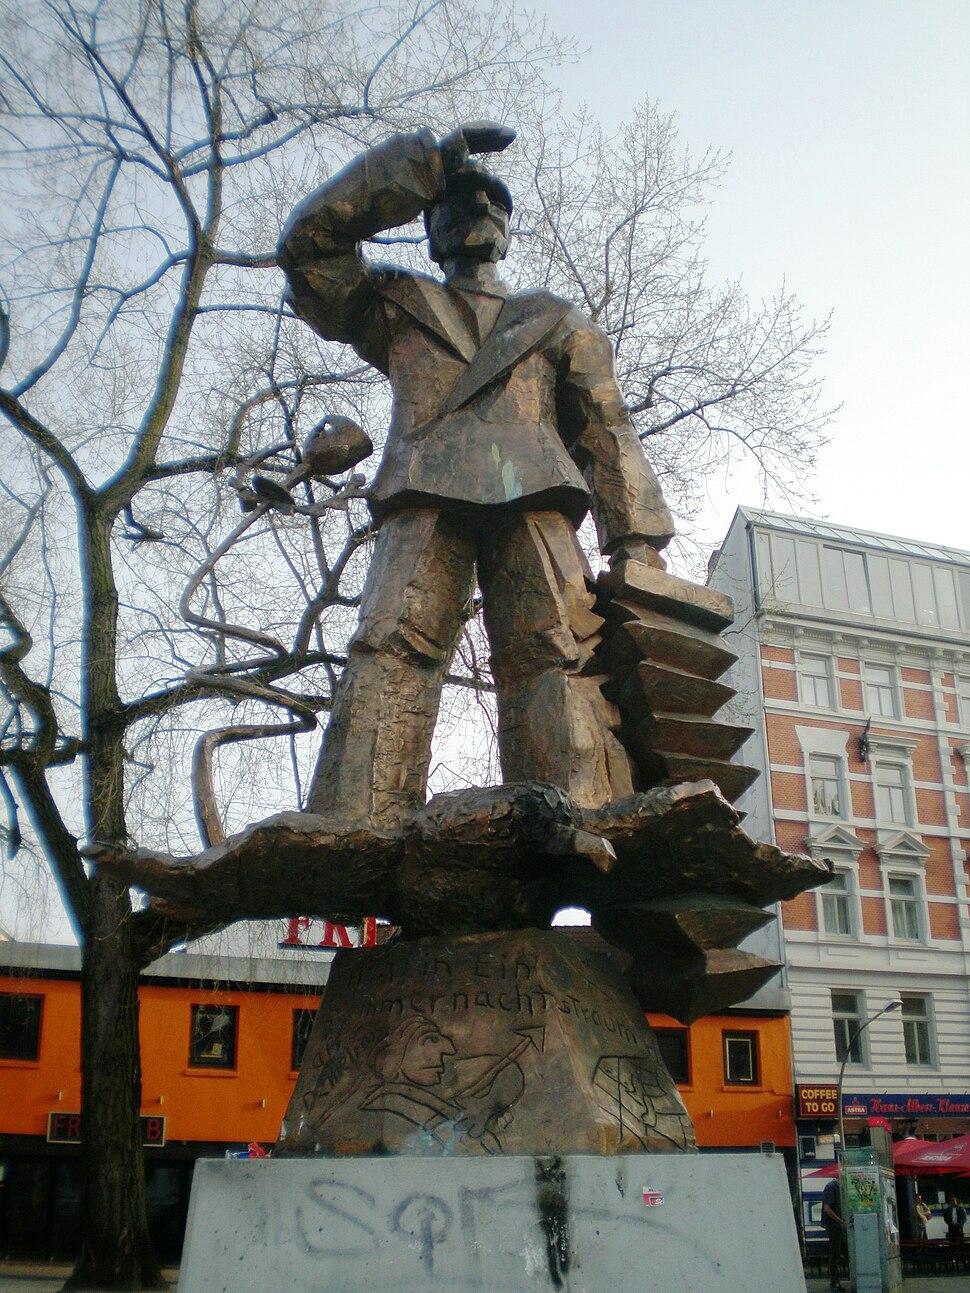 J%C3%B6rg Immendorff 1986, Hans- Albers-Denkmal (Hans Albers Memorial), Hamburg, Germany 6.jpg